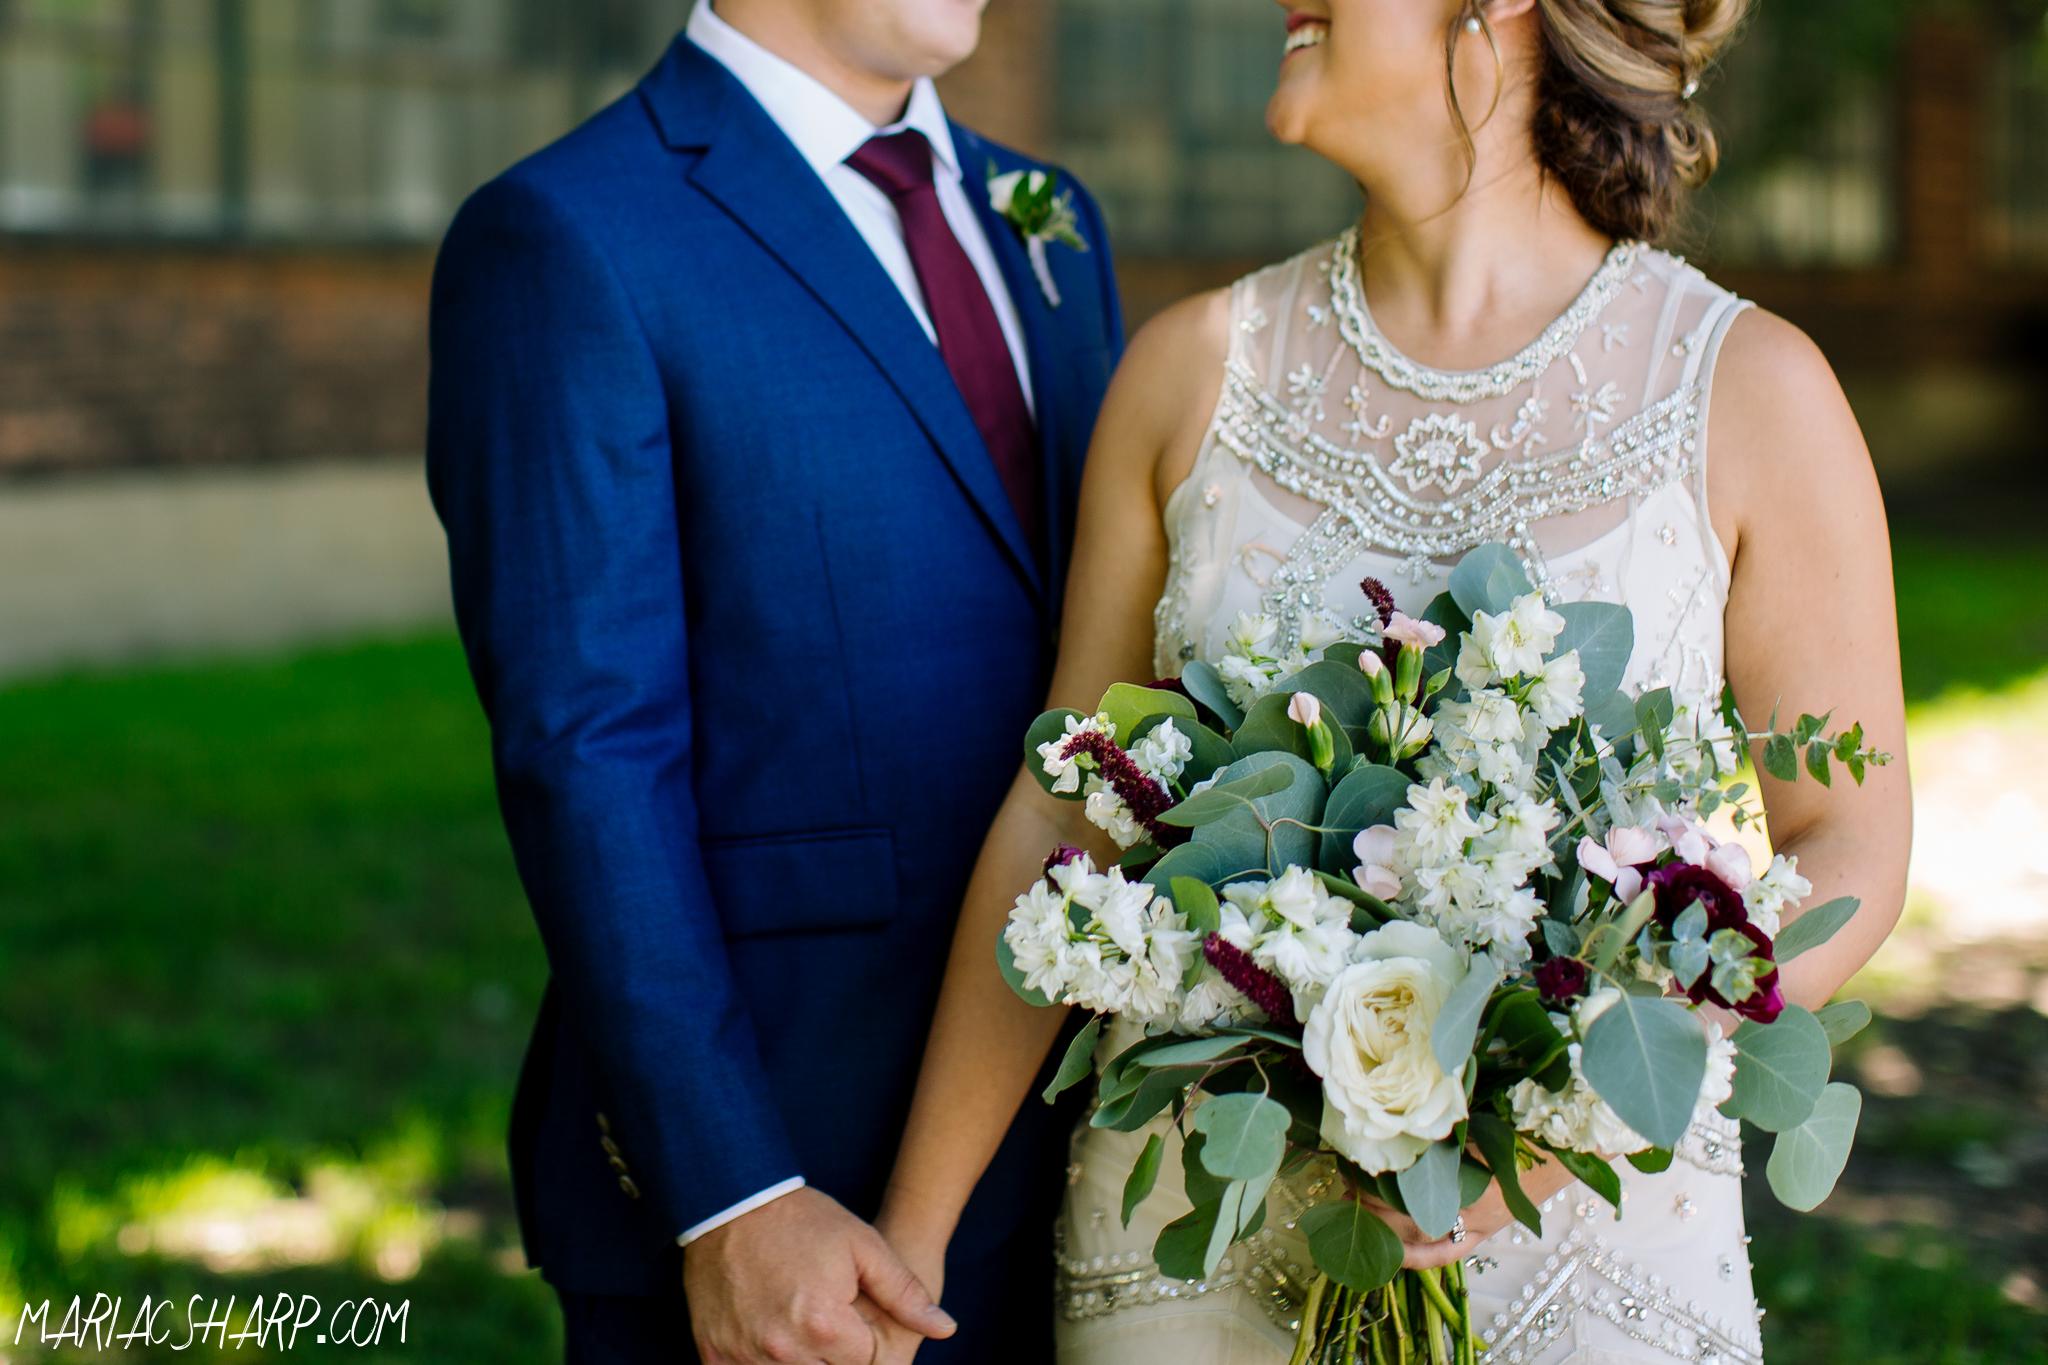 Cassie-Larson-Matt-Seccombe-wedding-20170715-133.jpg